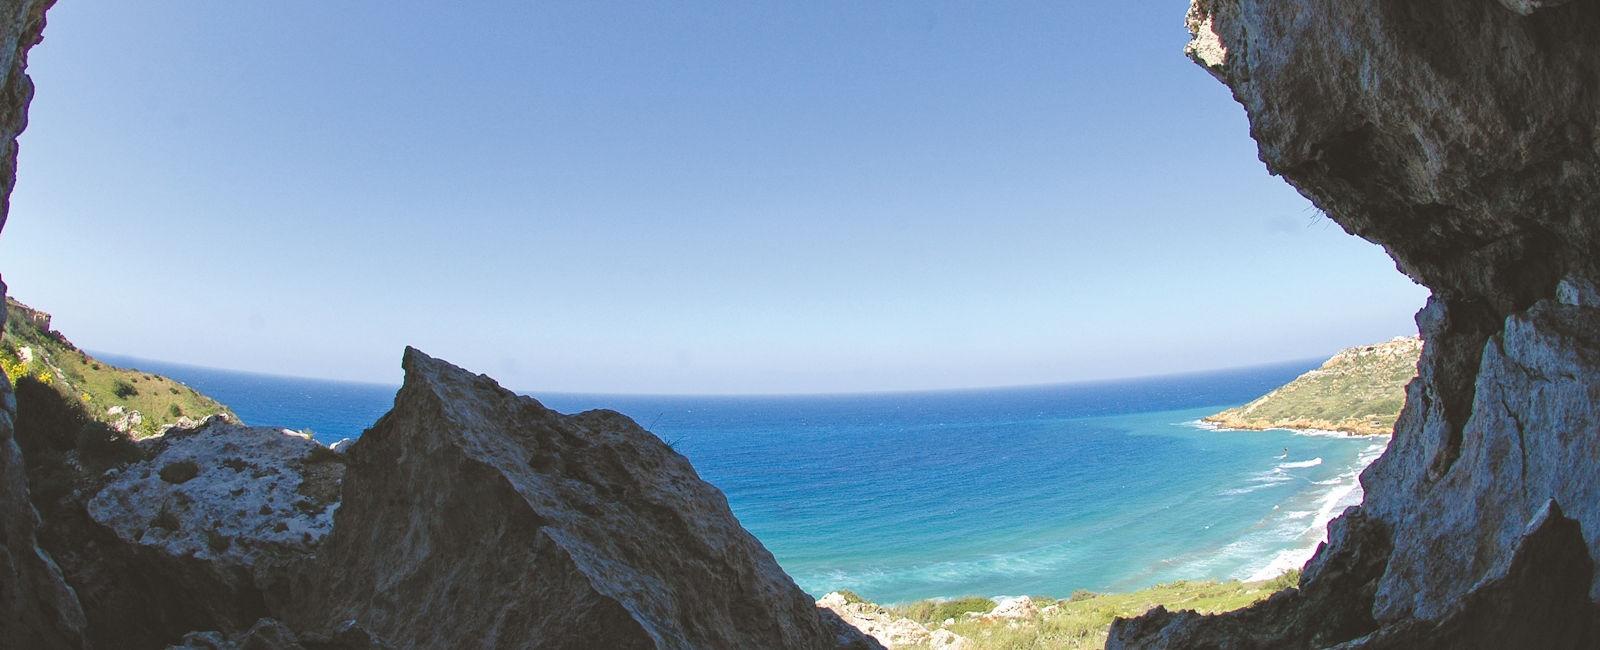 Gozo sea image